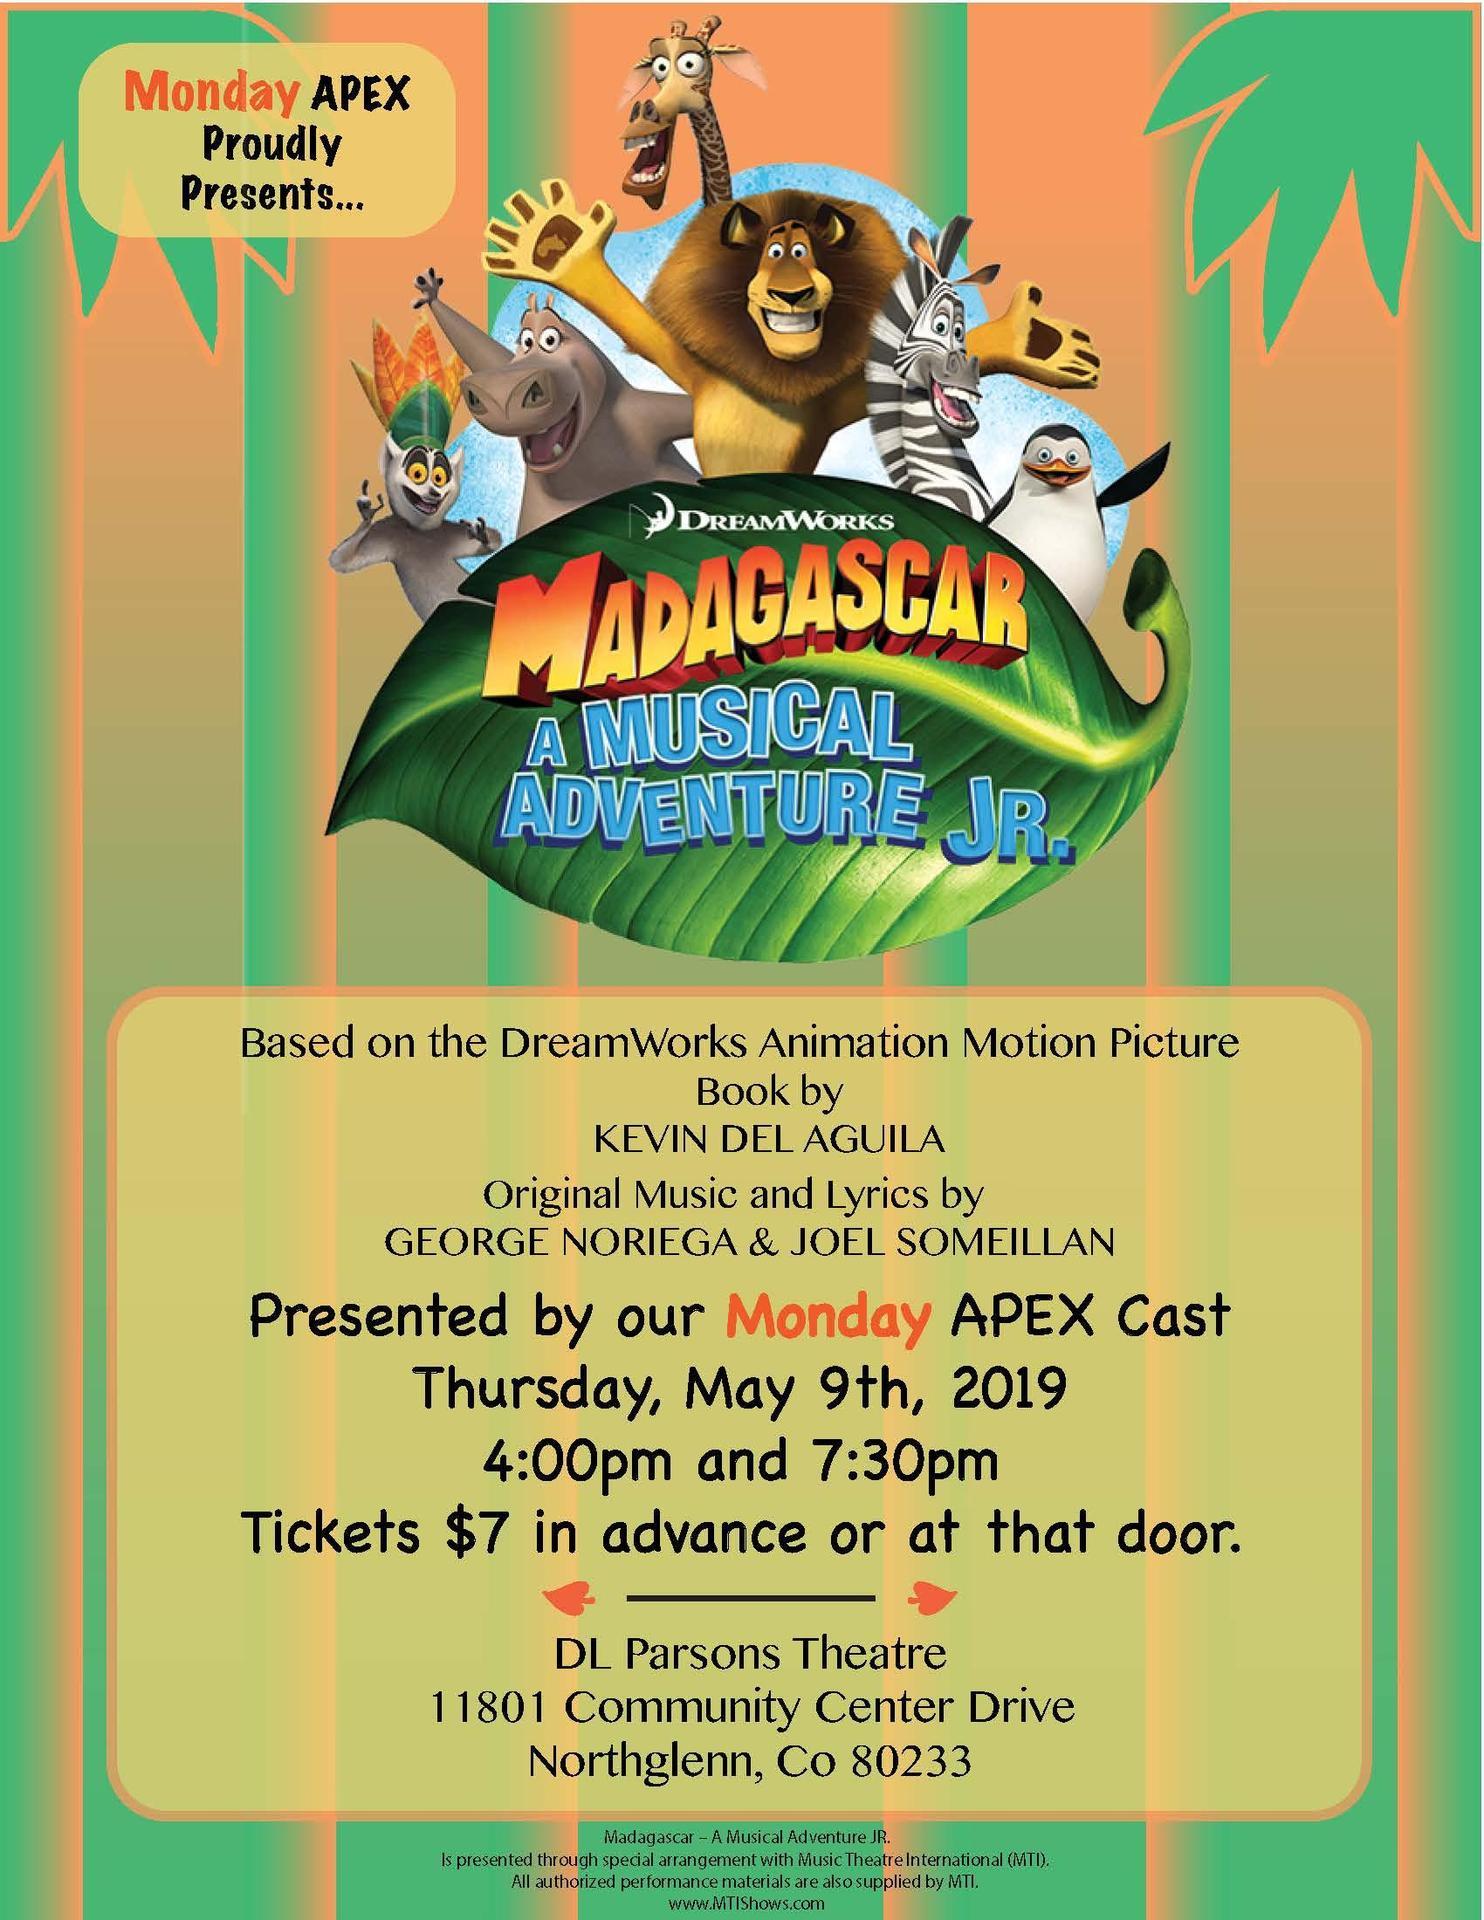 madagascar jr. poster